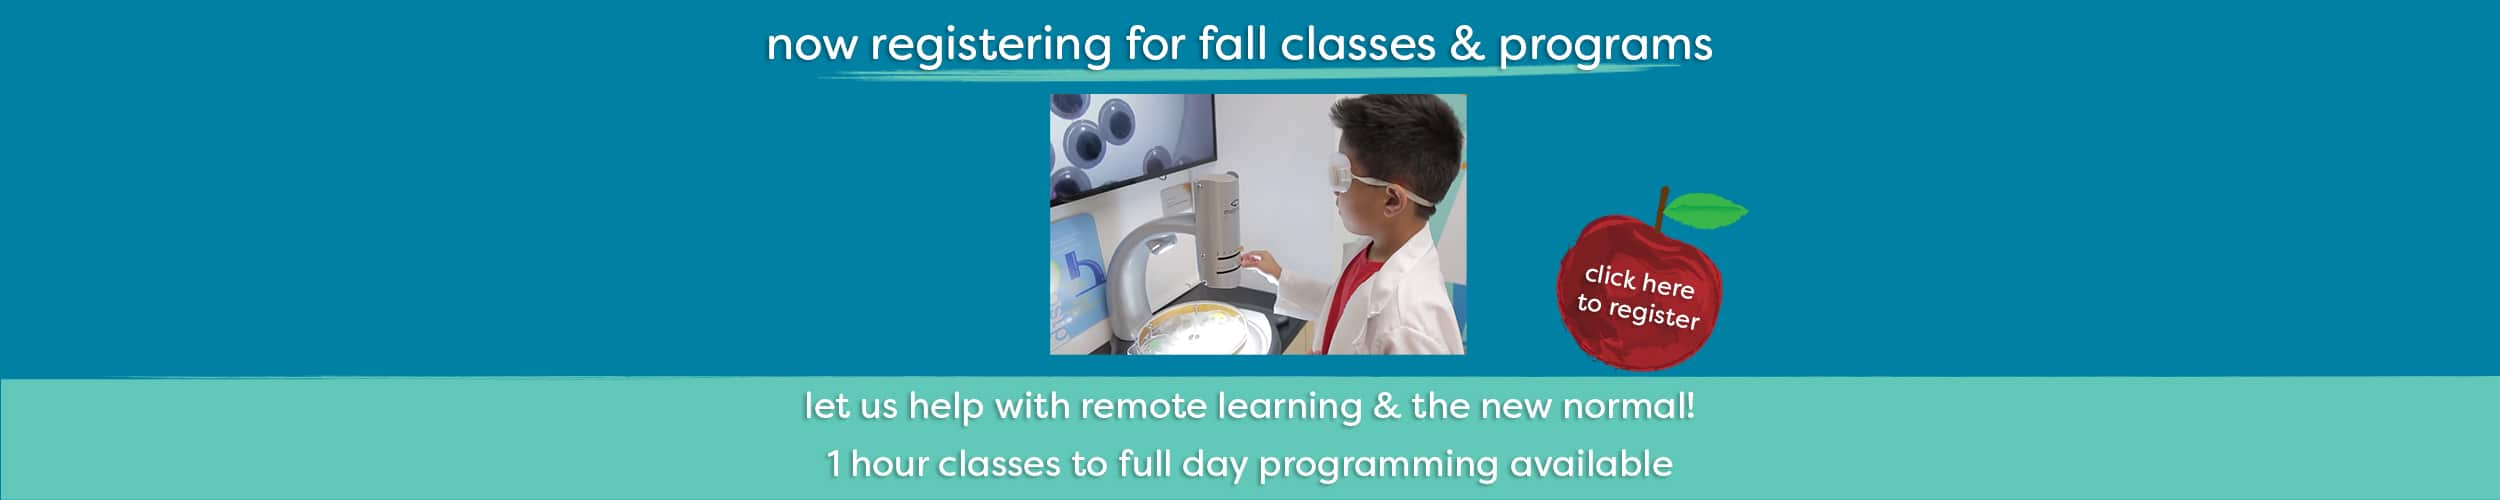 fall-classes-webslide-rev